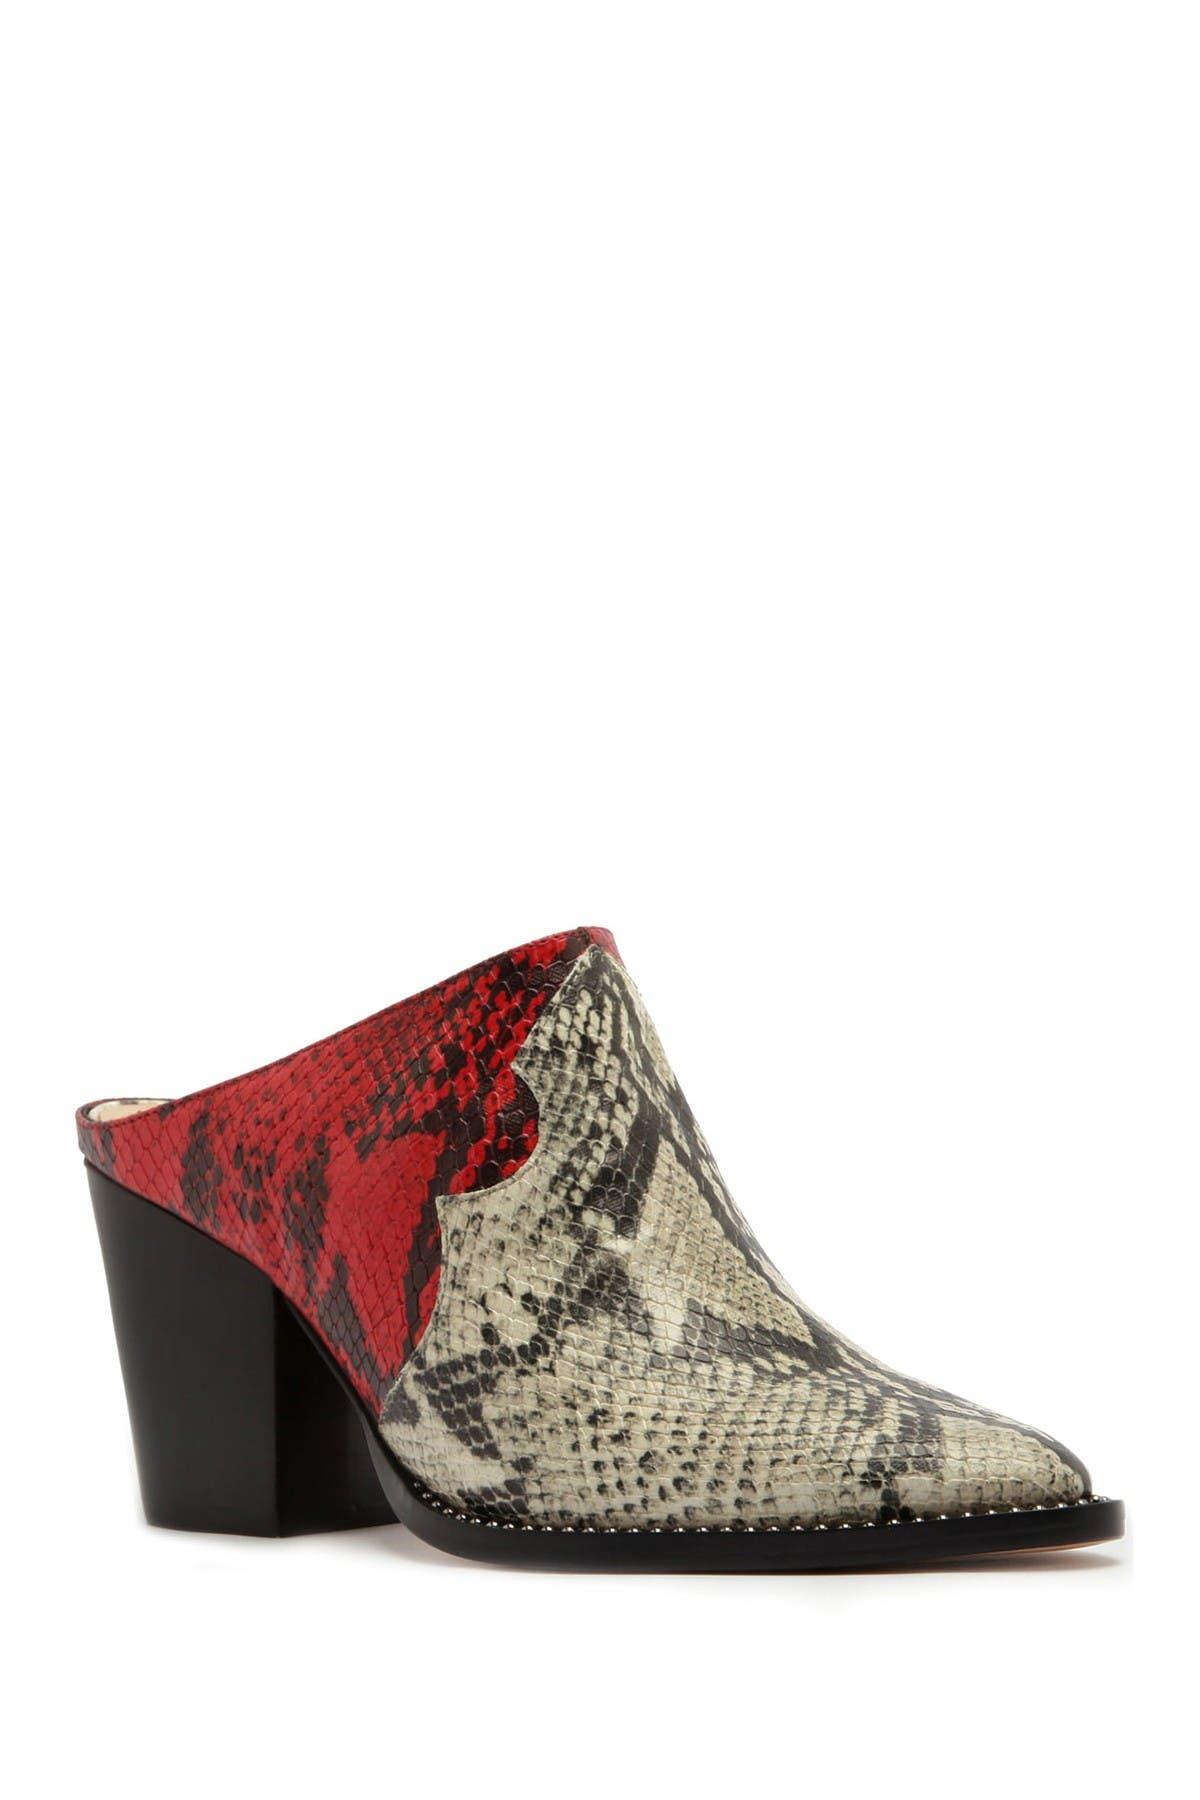 Image of Schutz Destiny Leather Snakeskin Print Mule